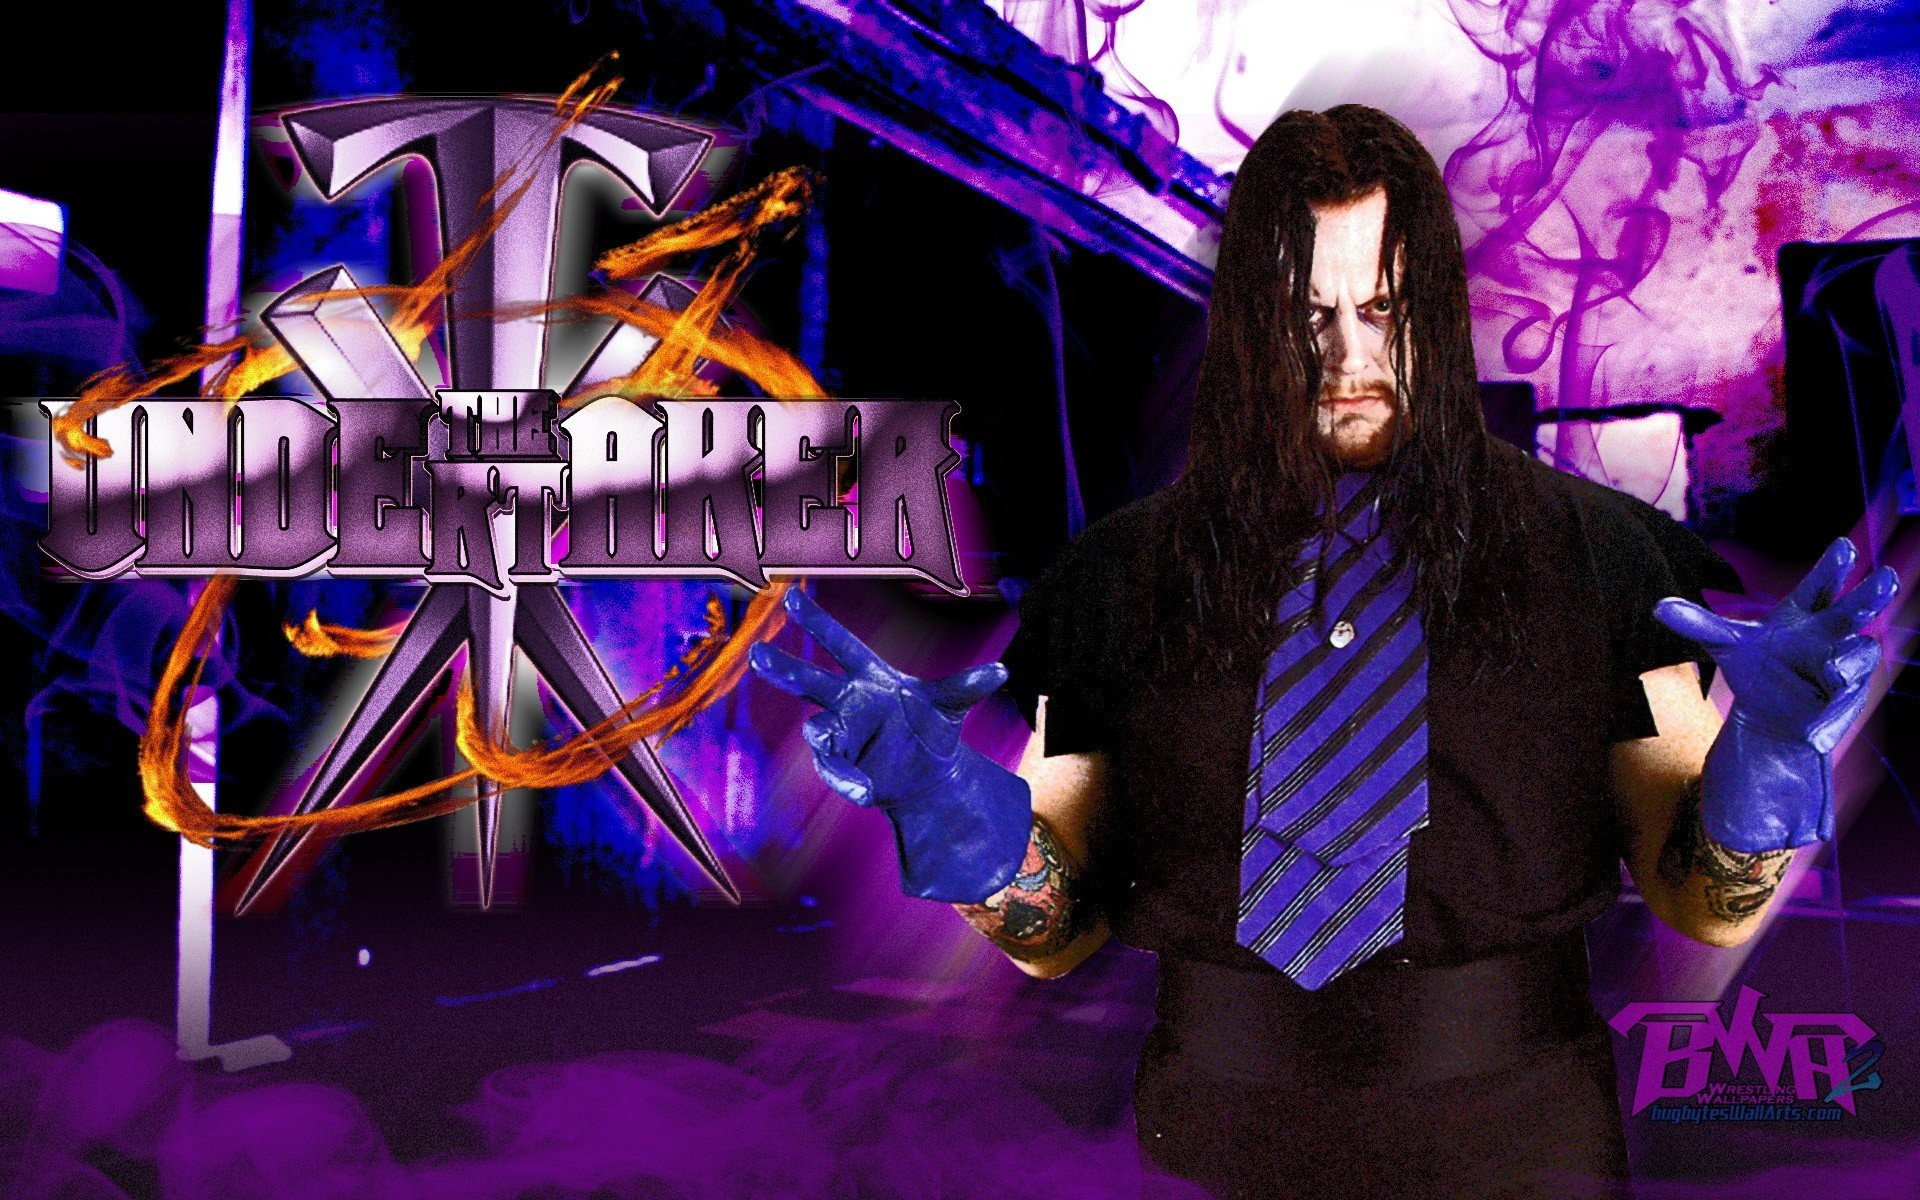 The Undertaker Hd Wallpaper Wallpaper Of Undertaker 67 Images